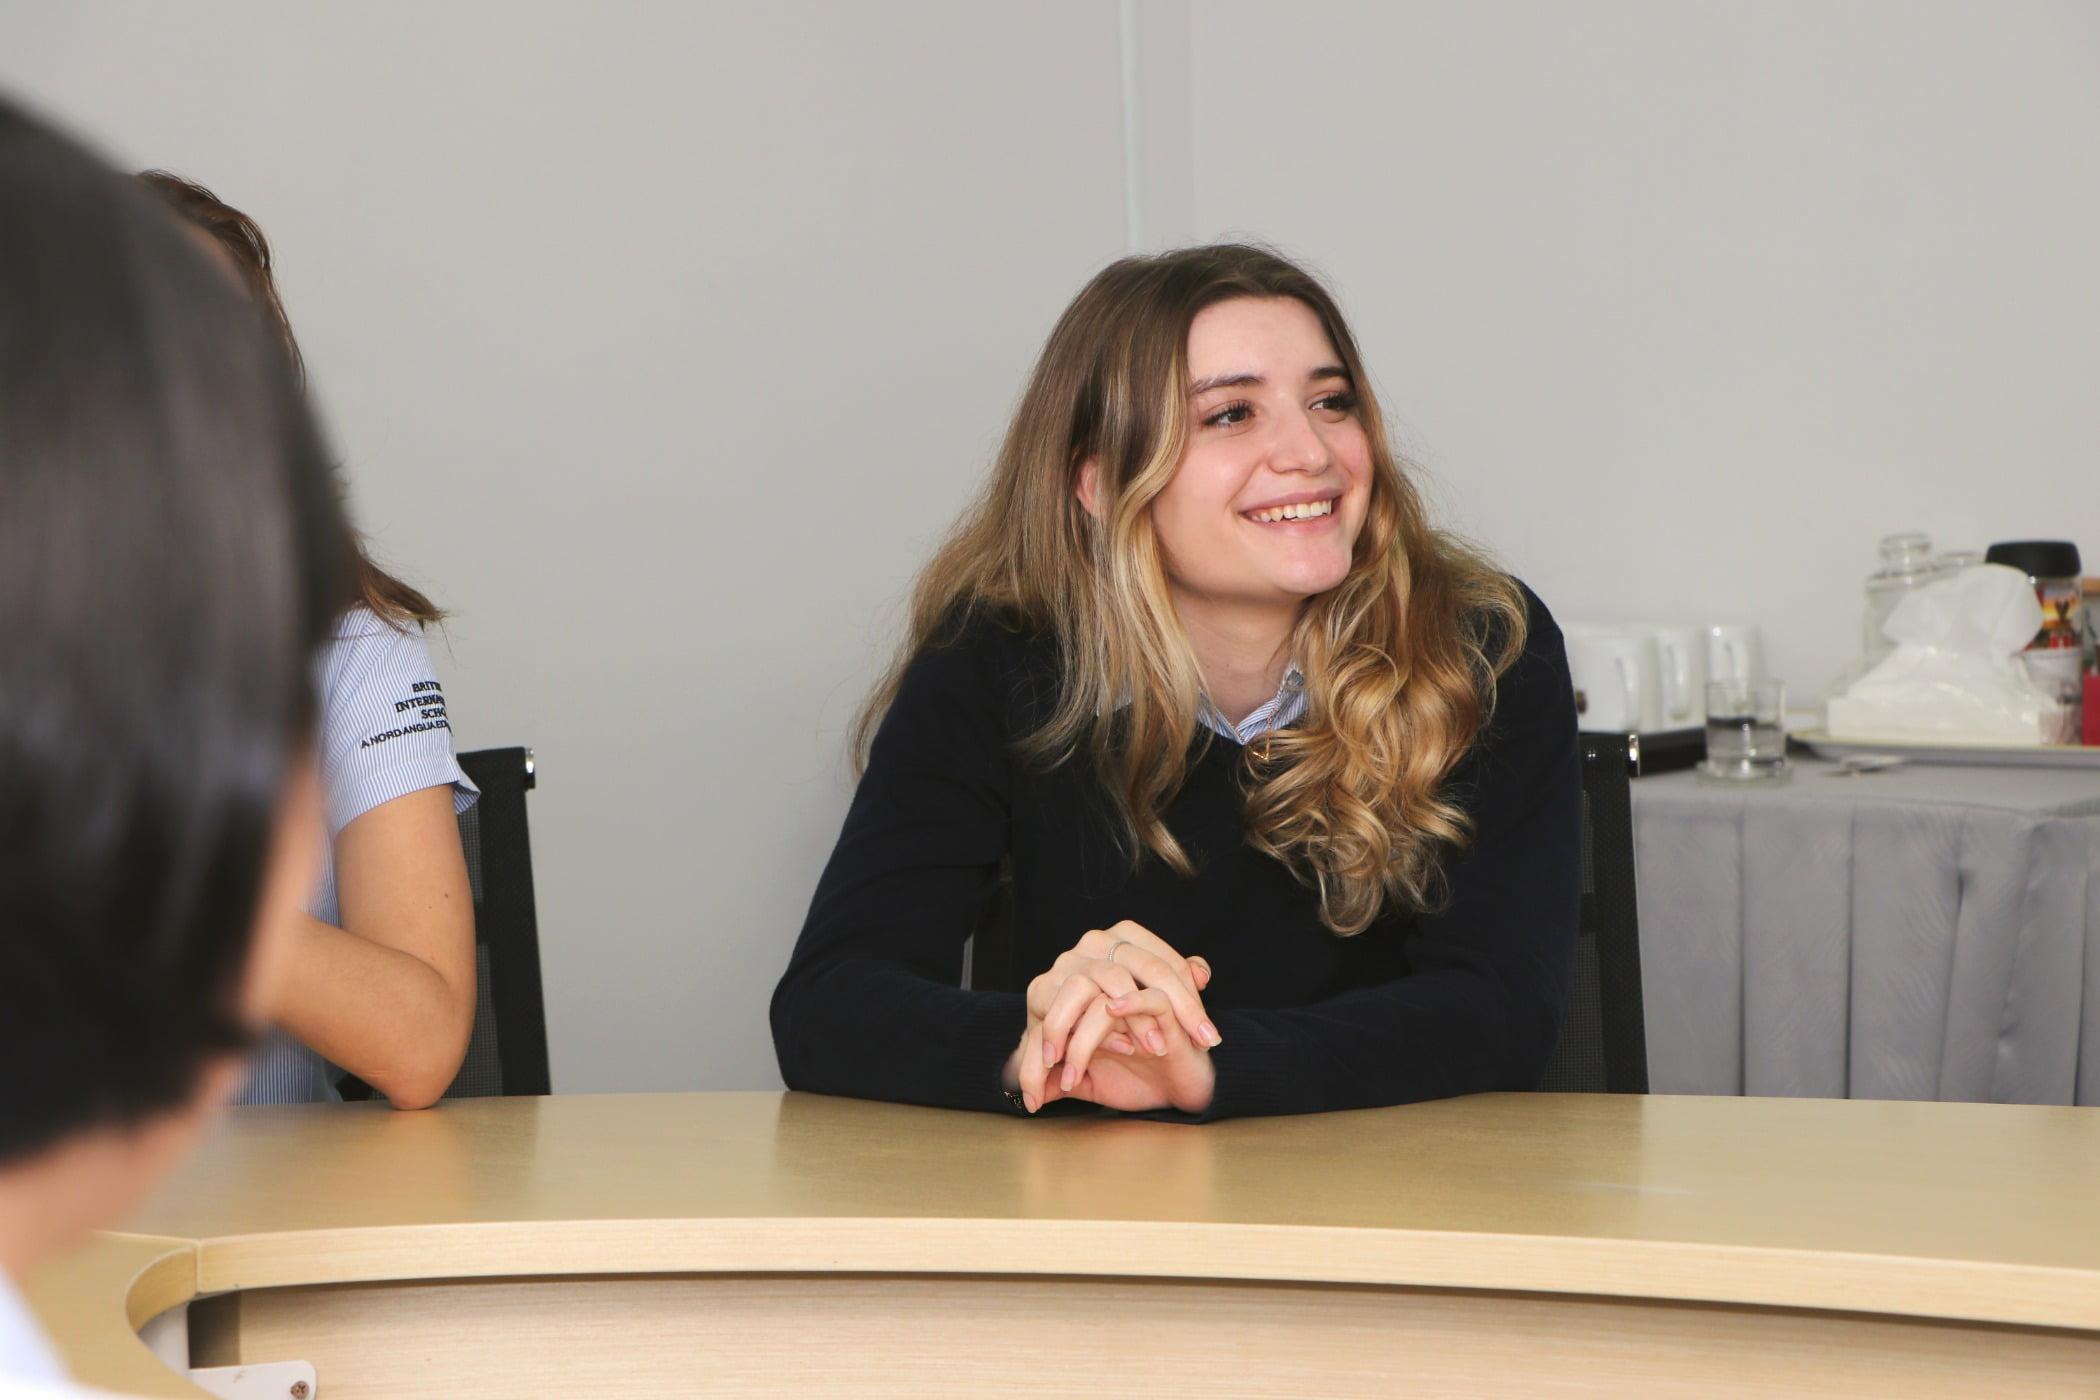 Smile, Table, Gesture, Desk